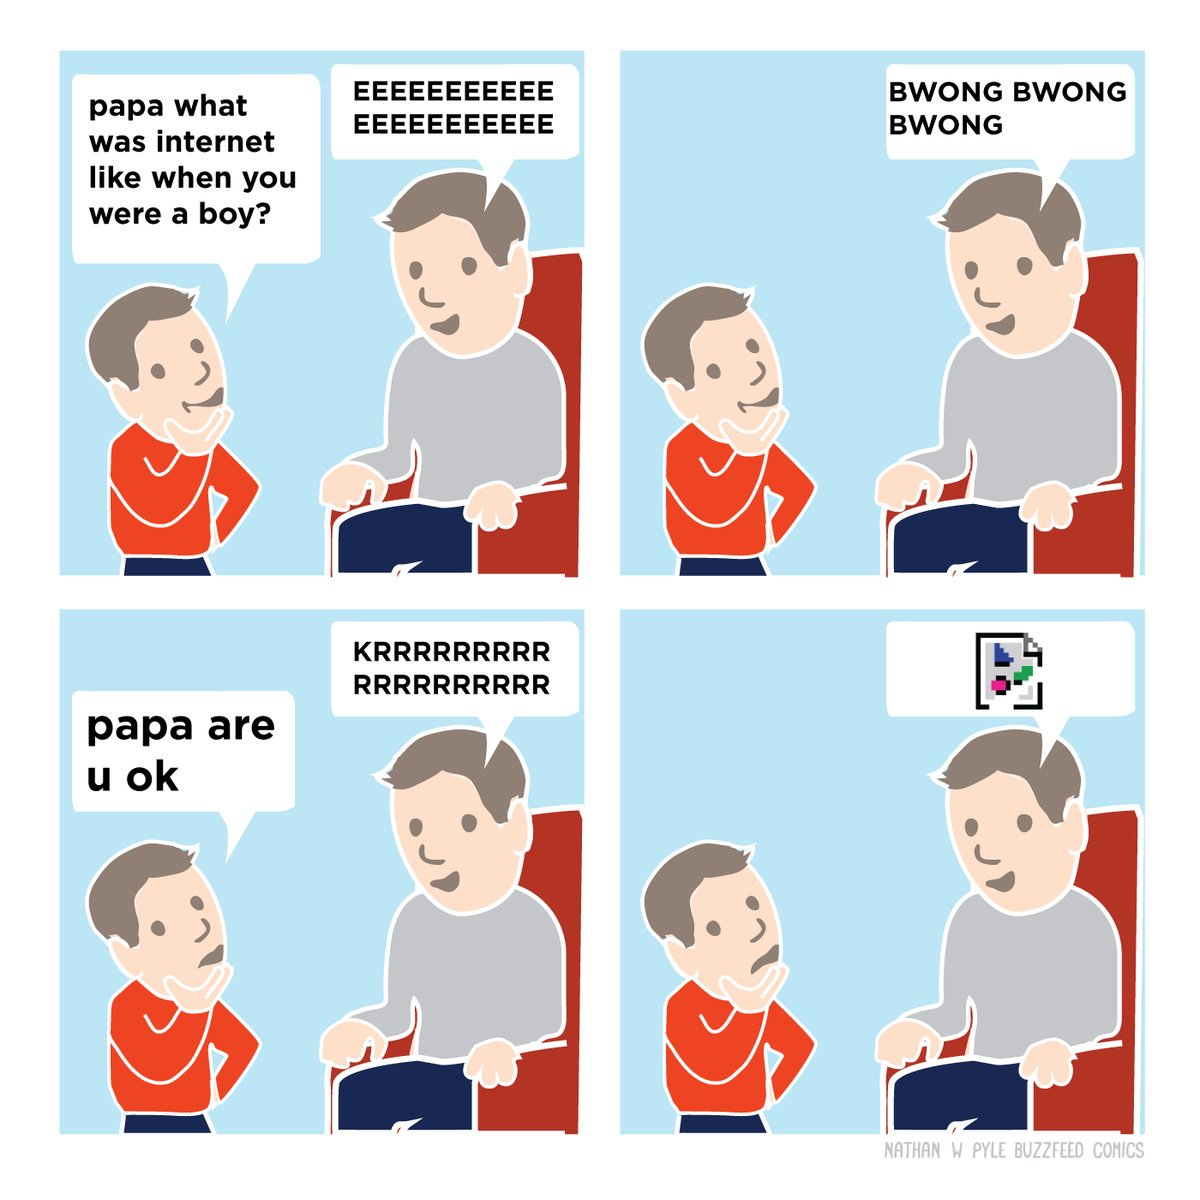 """Papa, what was internet like when you were a boy?"" https://t.co/RFwP7p57JU"